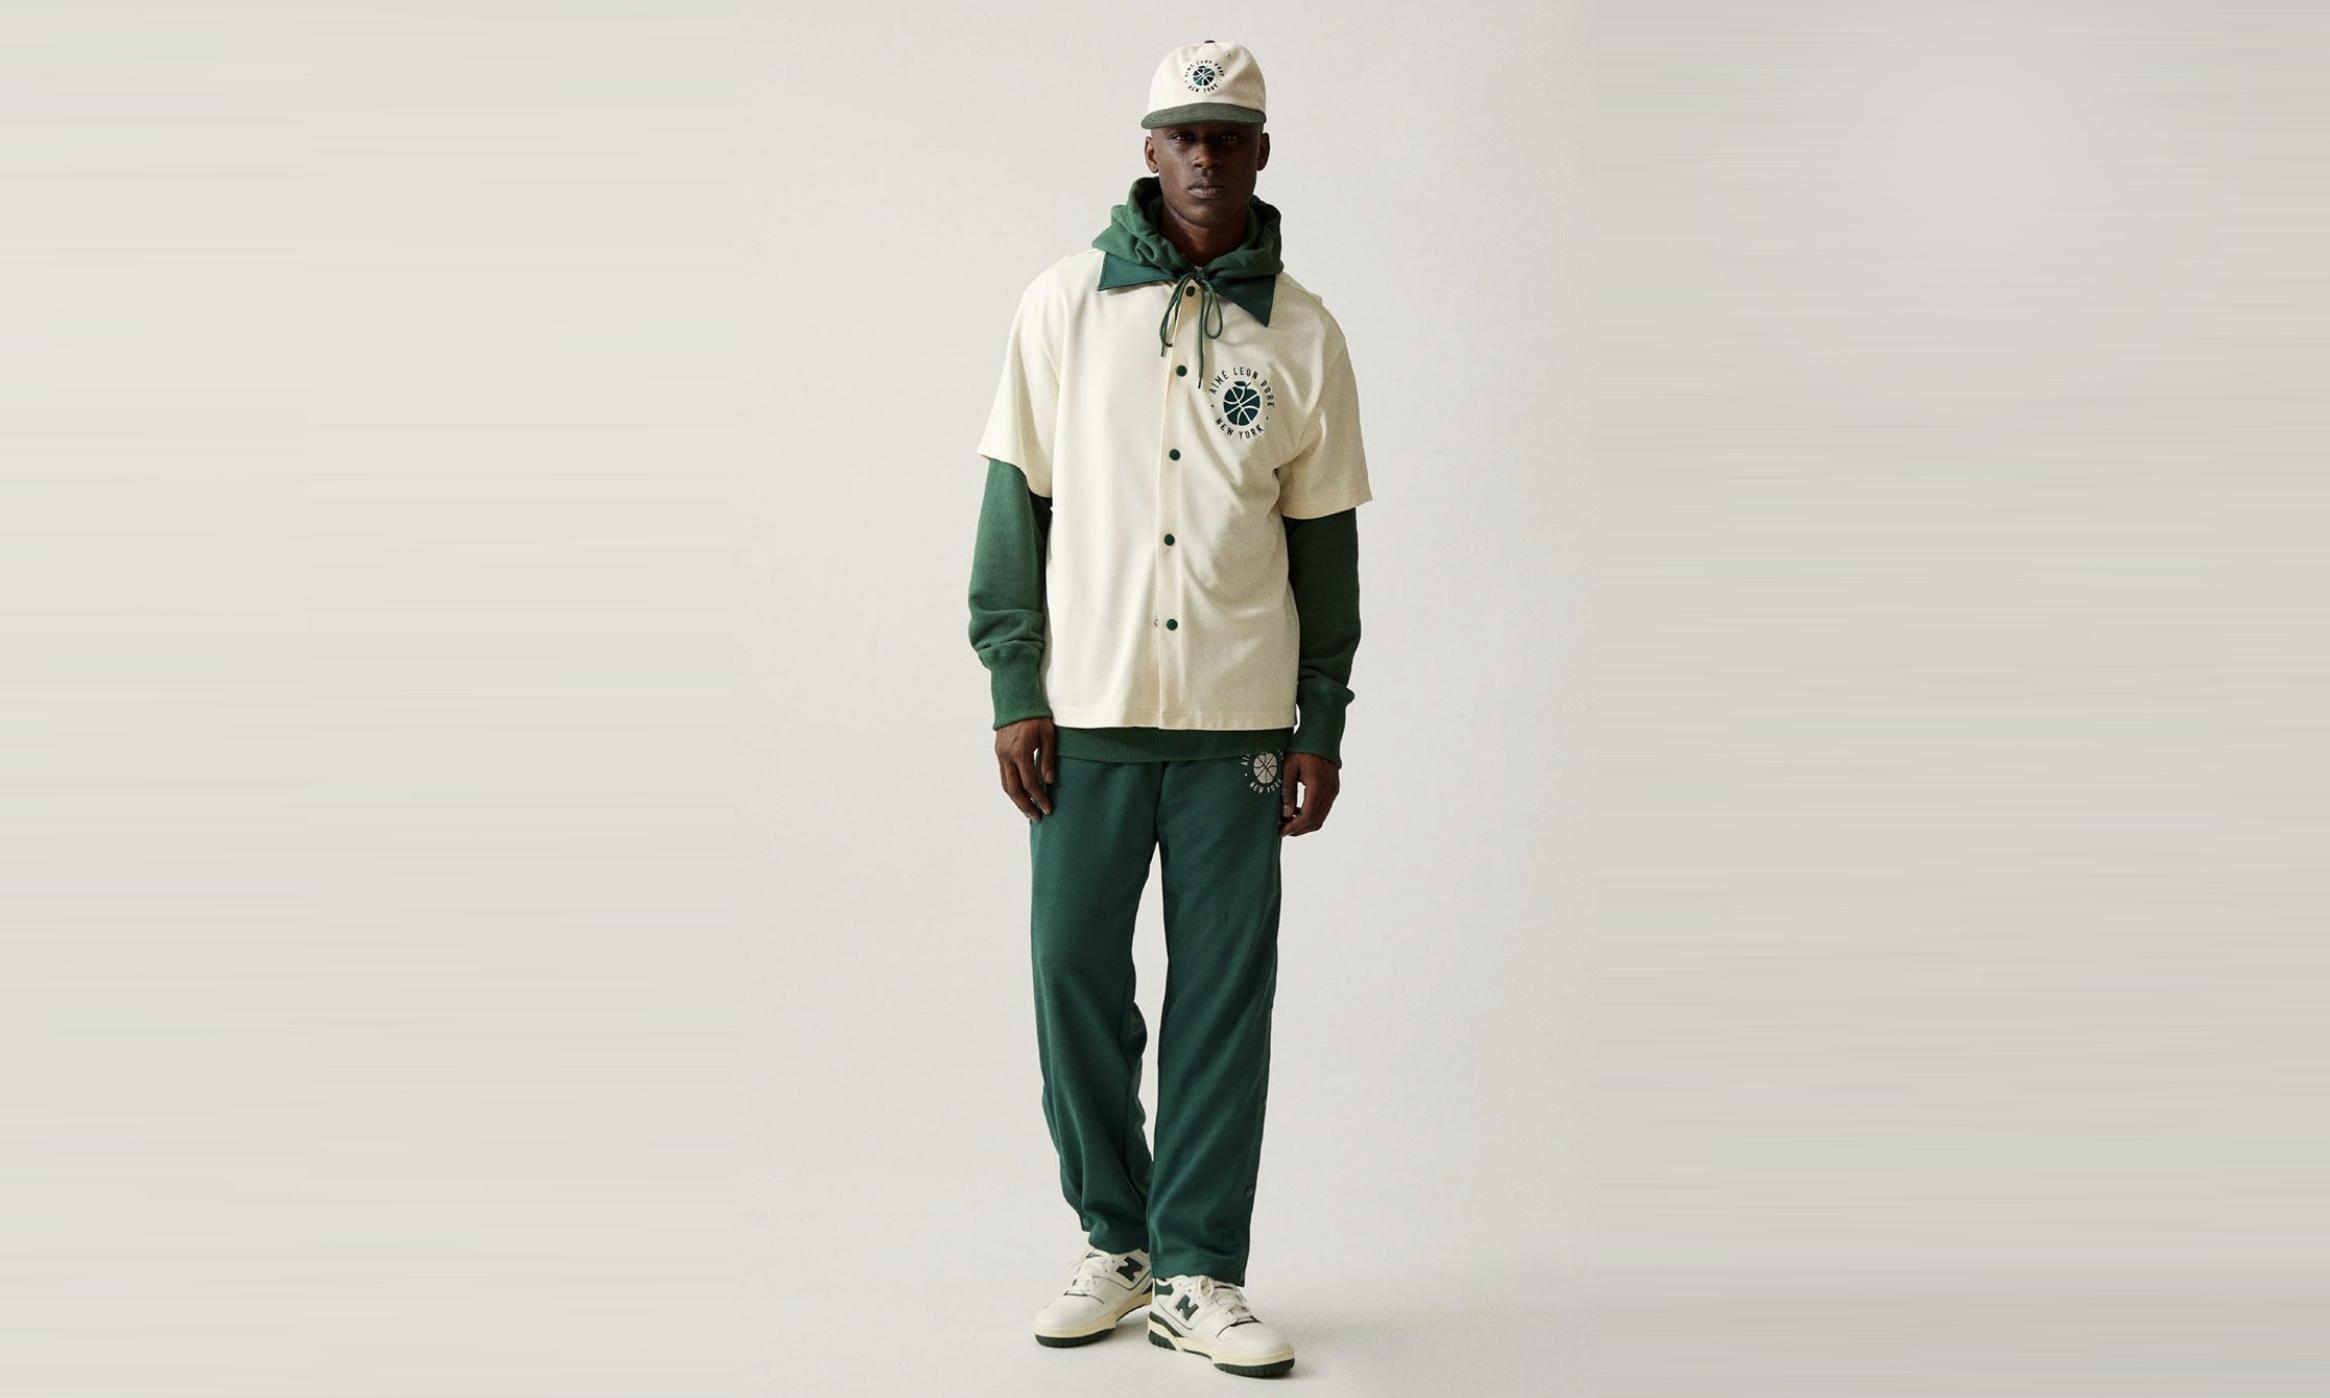 Aimé Leon Dore x New Balance 服饰胶囊系列独家发售